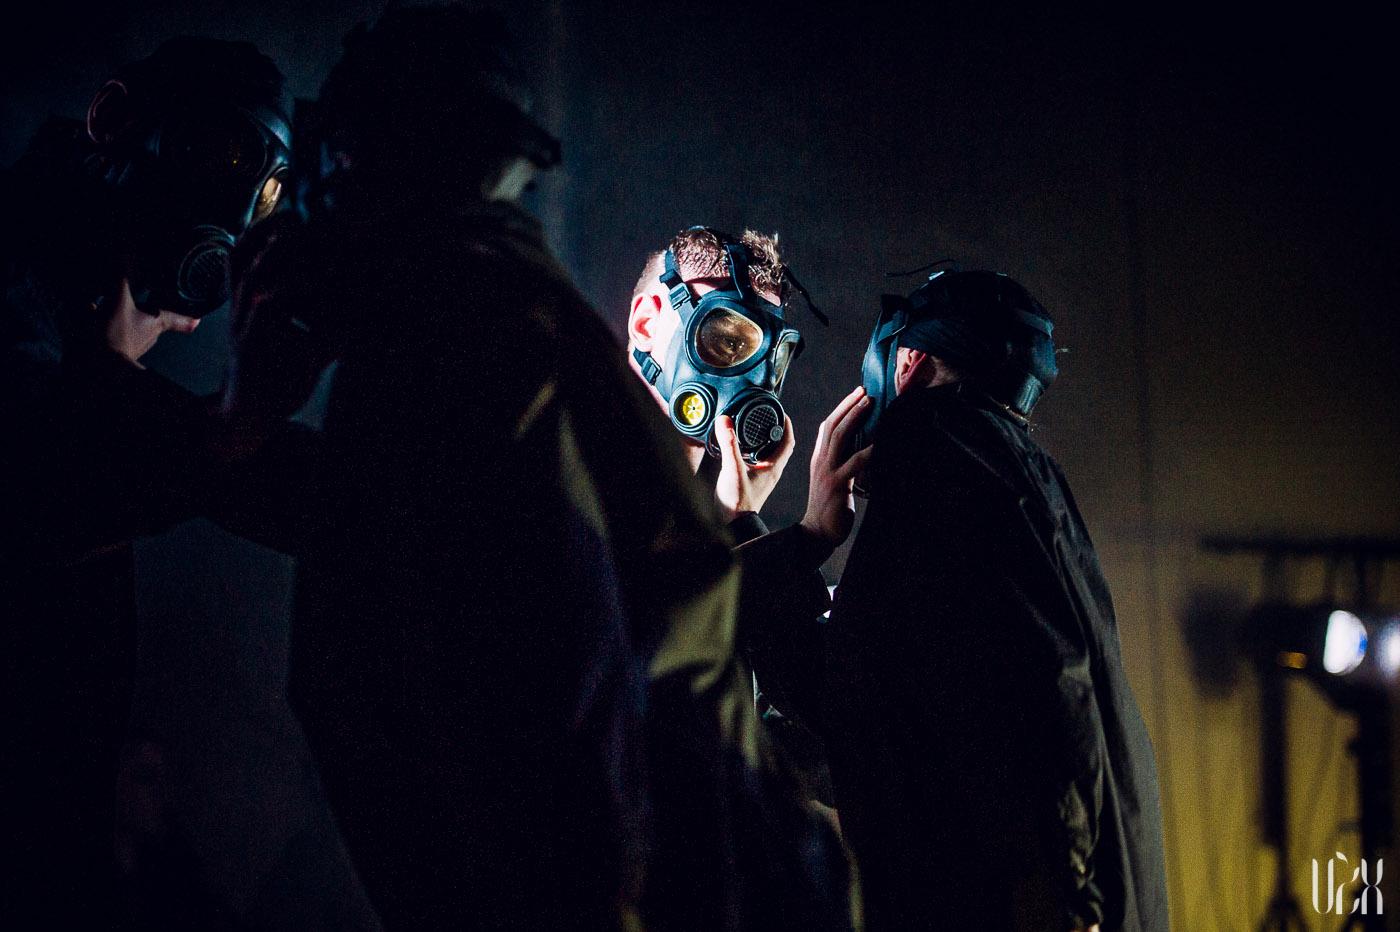 E.sabaliauskaite Vzx.lt Faustas Teatras Event 029